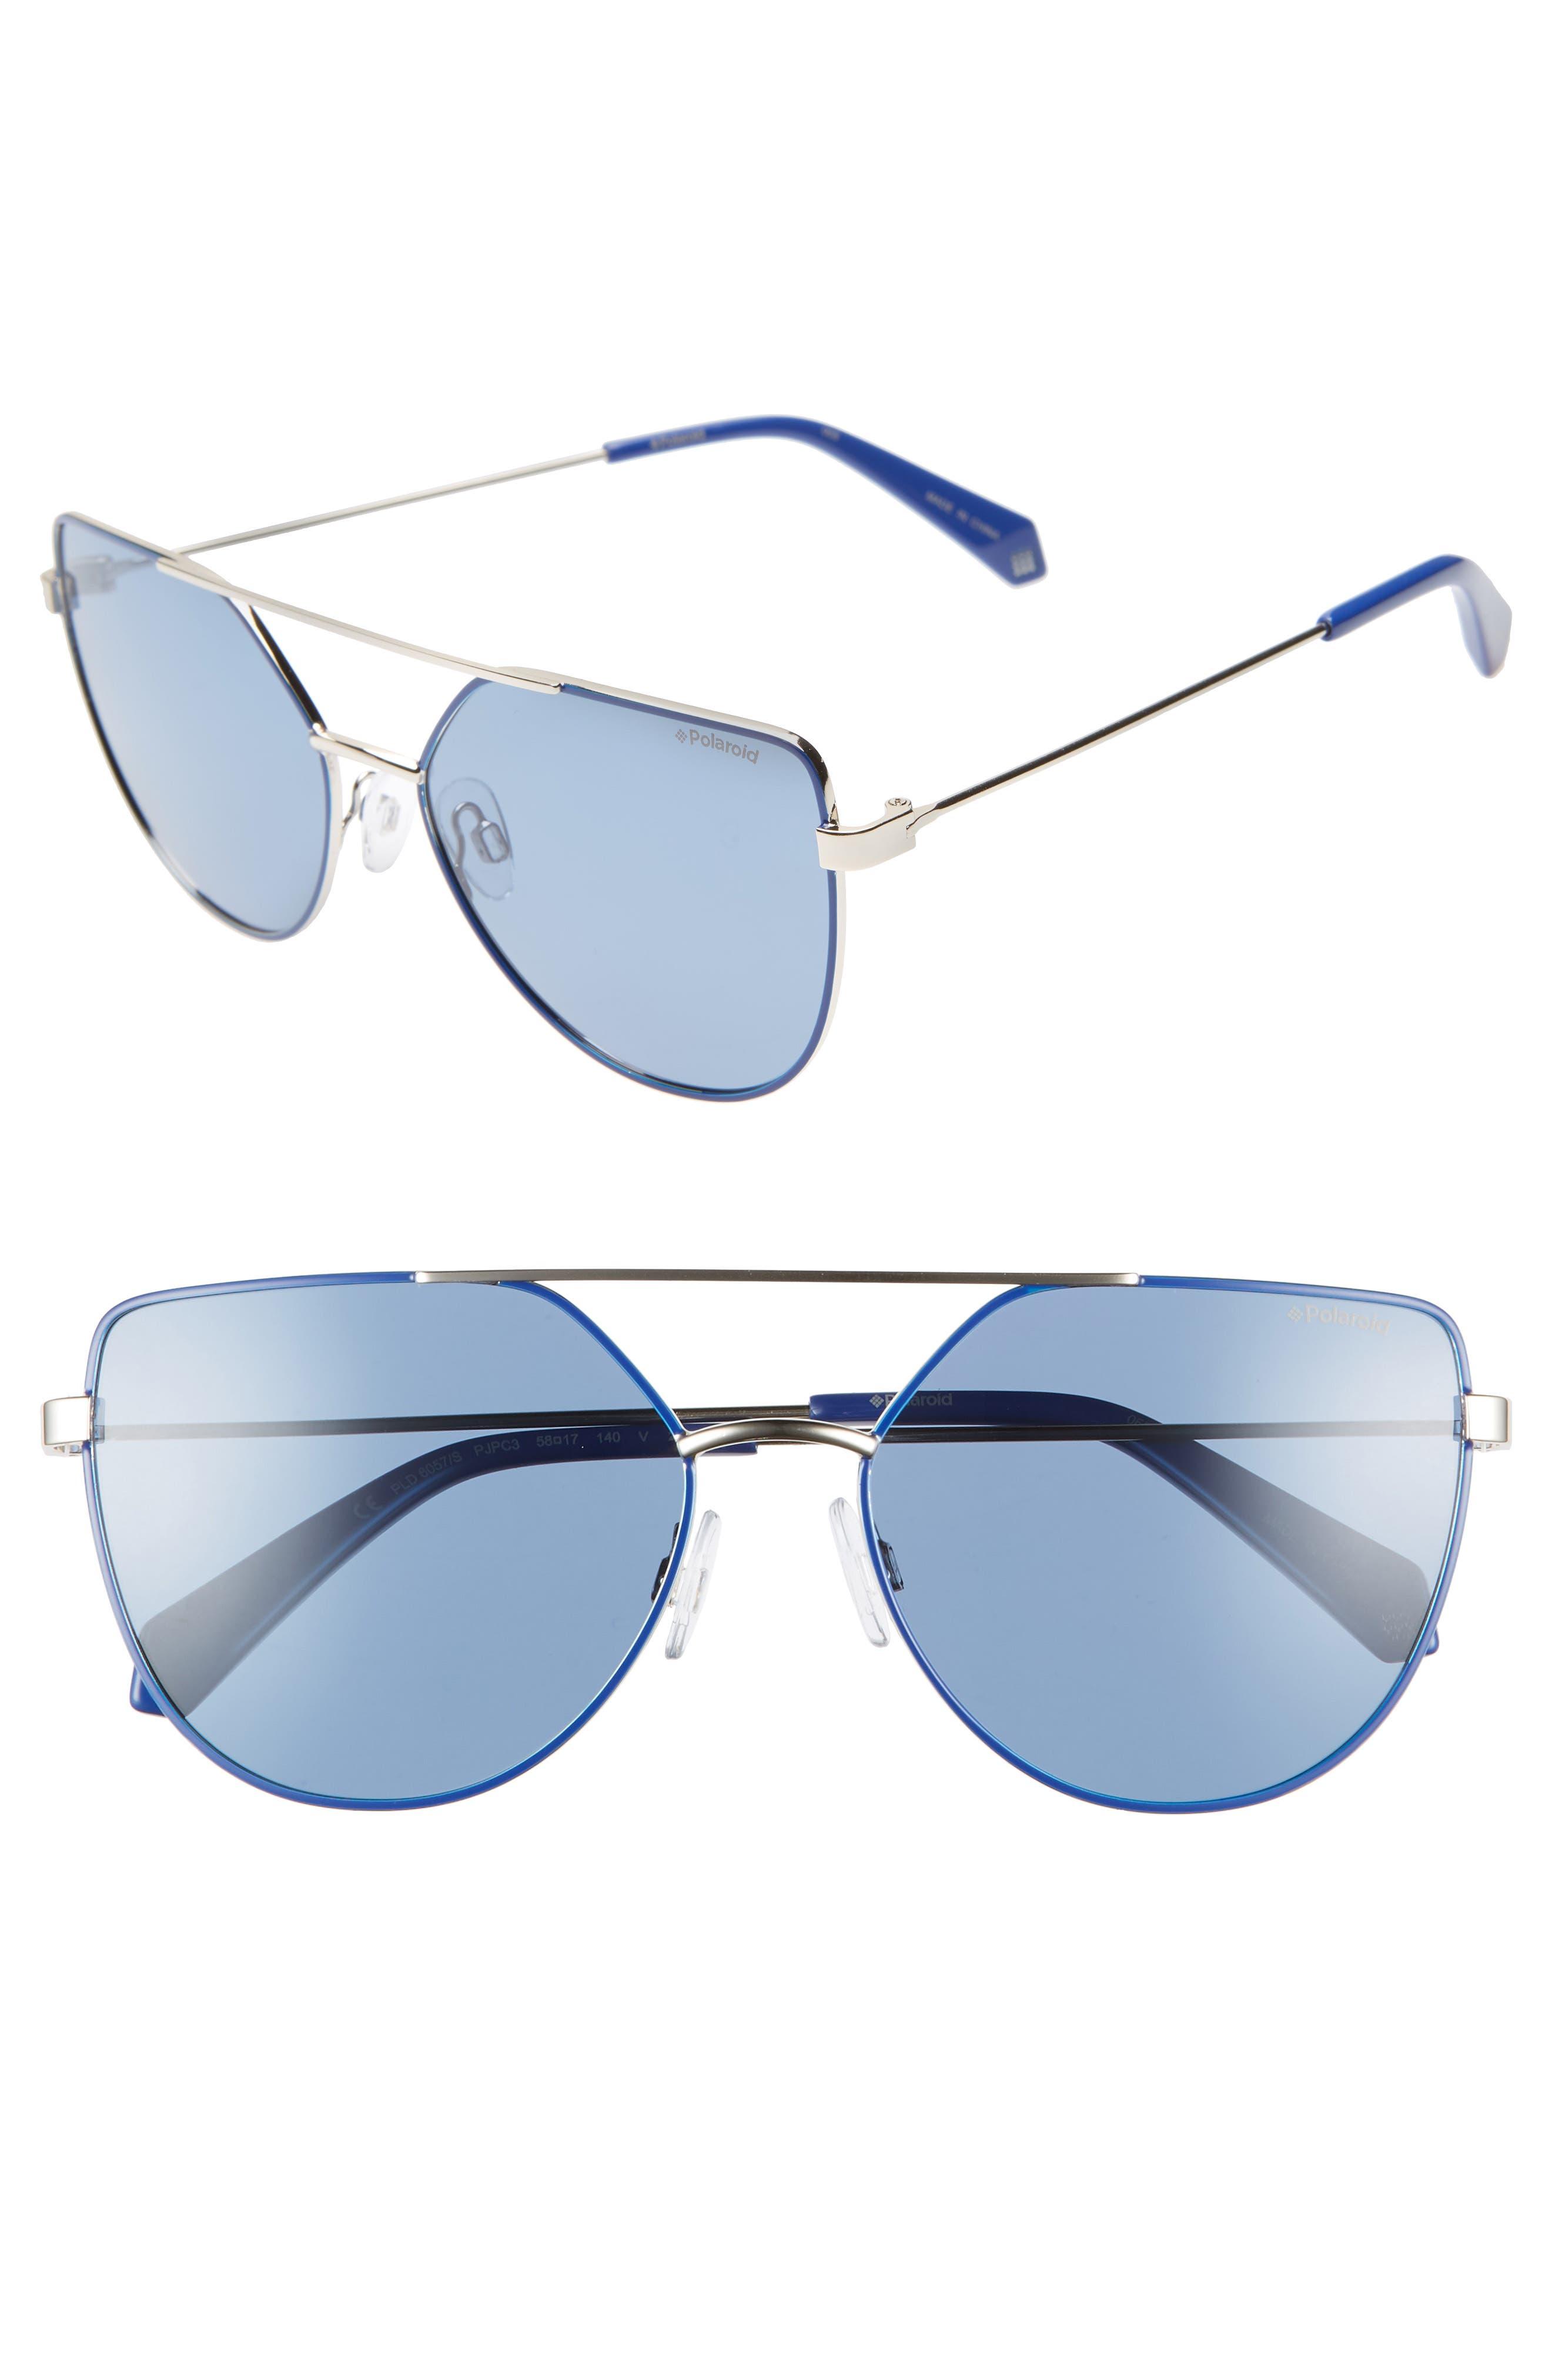 POLAROID 58Mm Polarized Sunglasses - Blue/ Gold